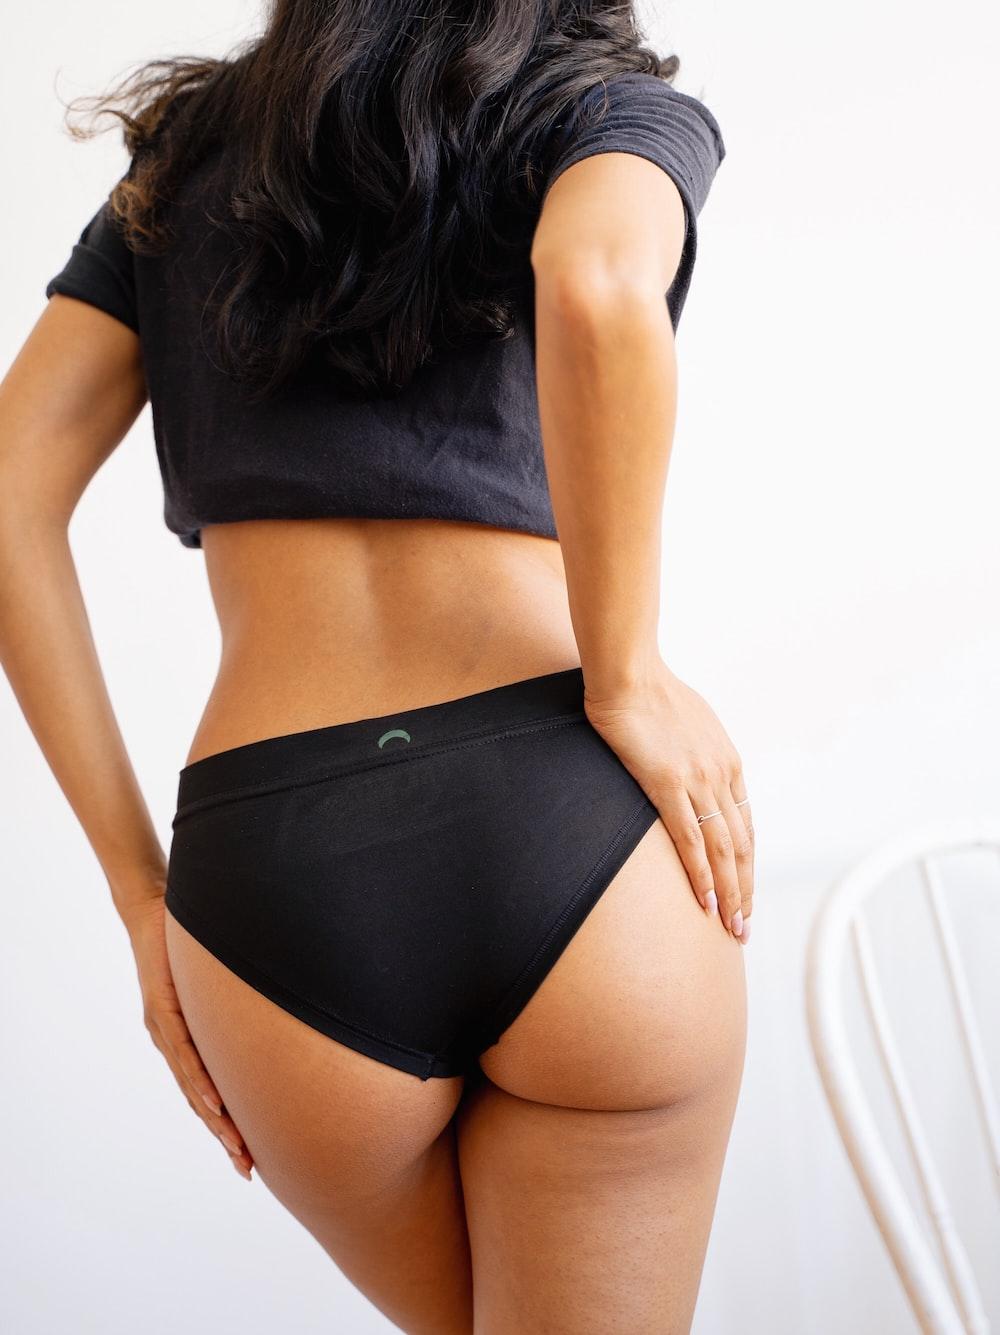 Ladies In Black Panties Pics Pics